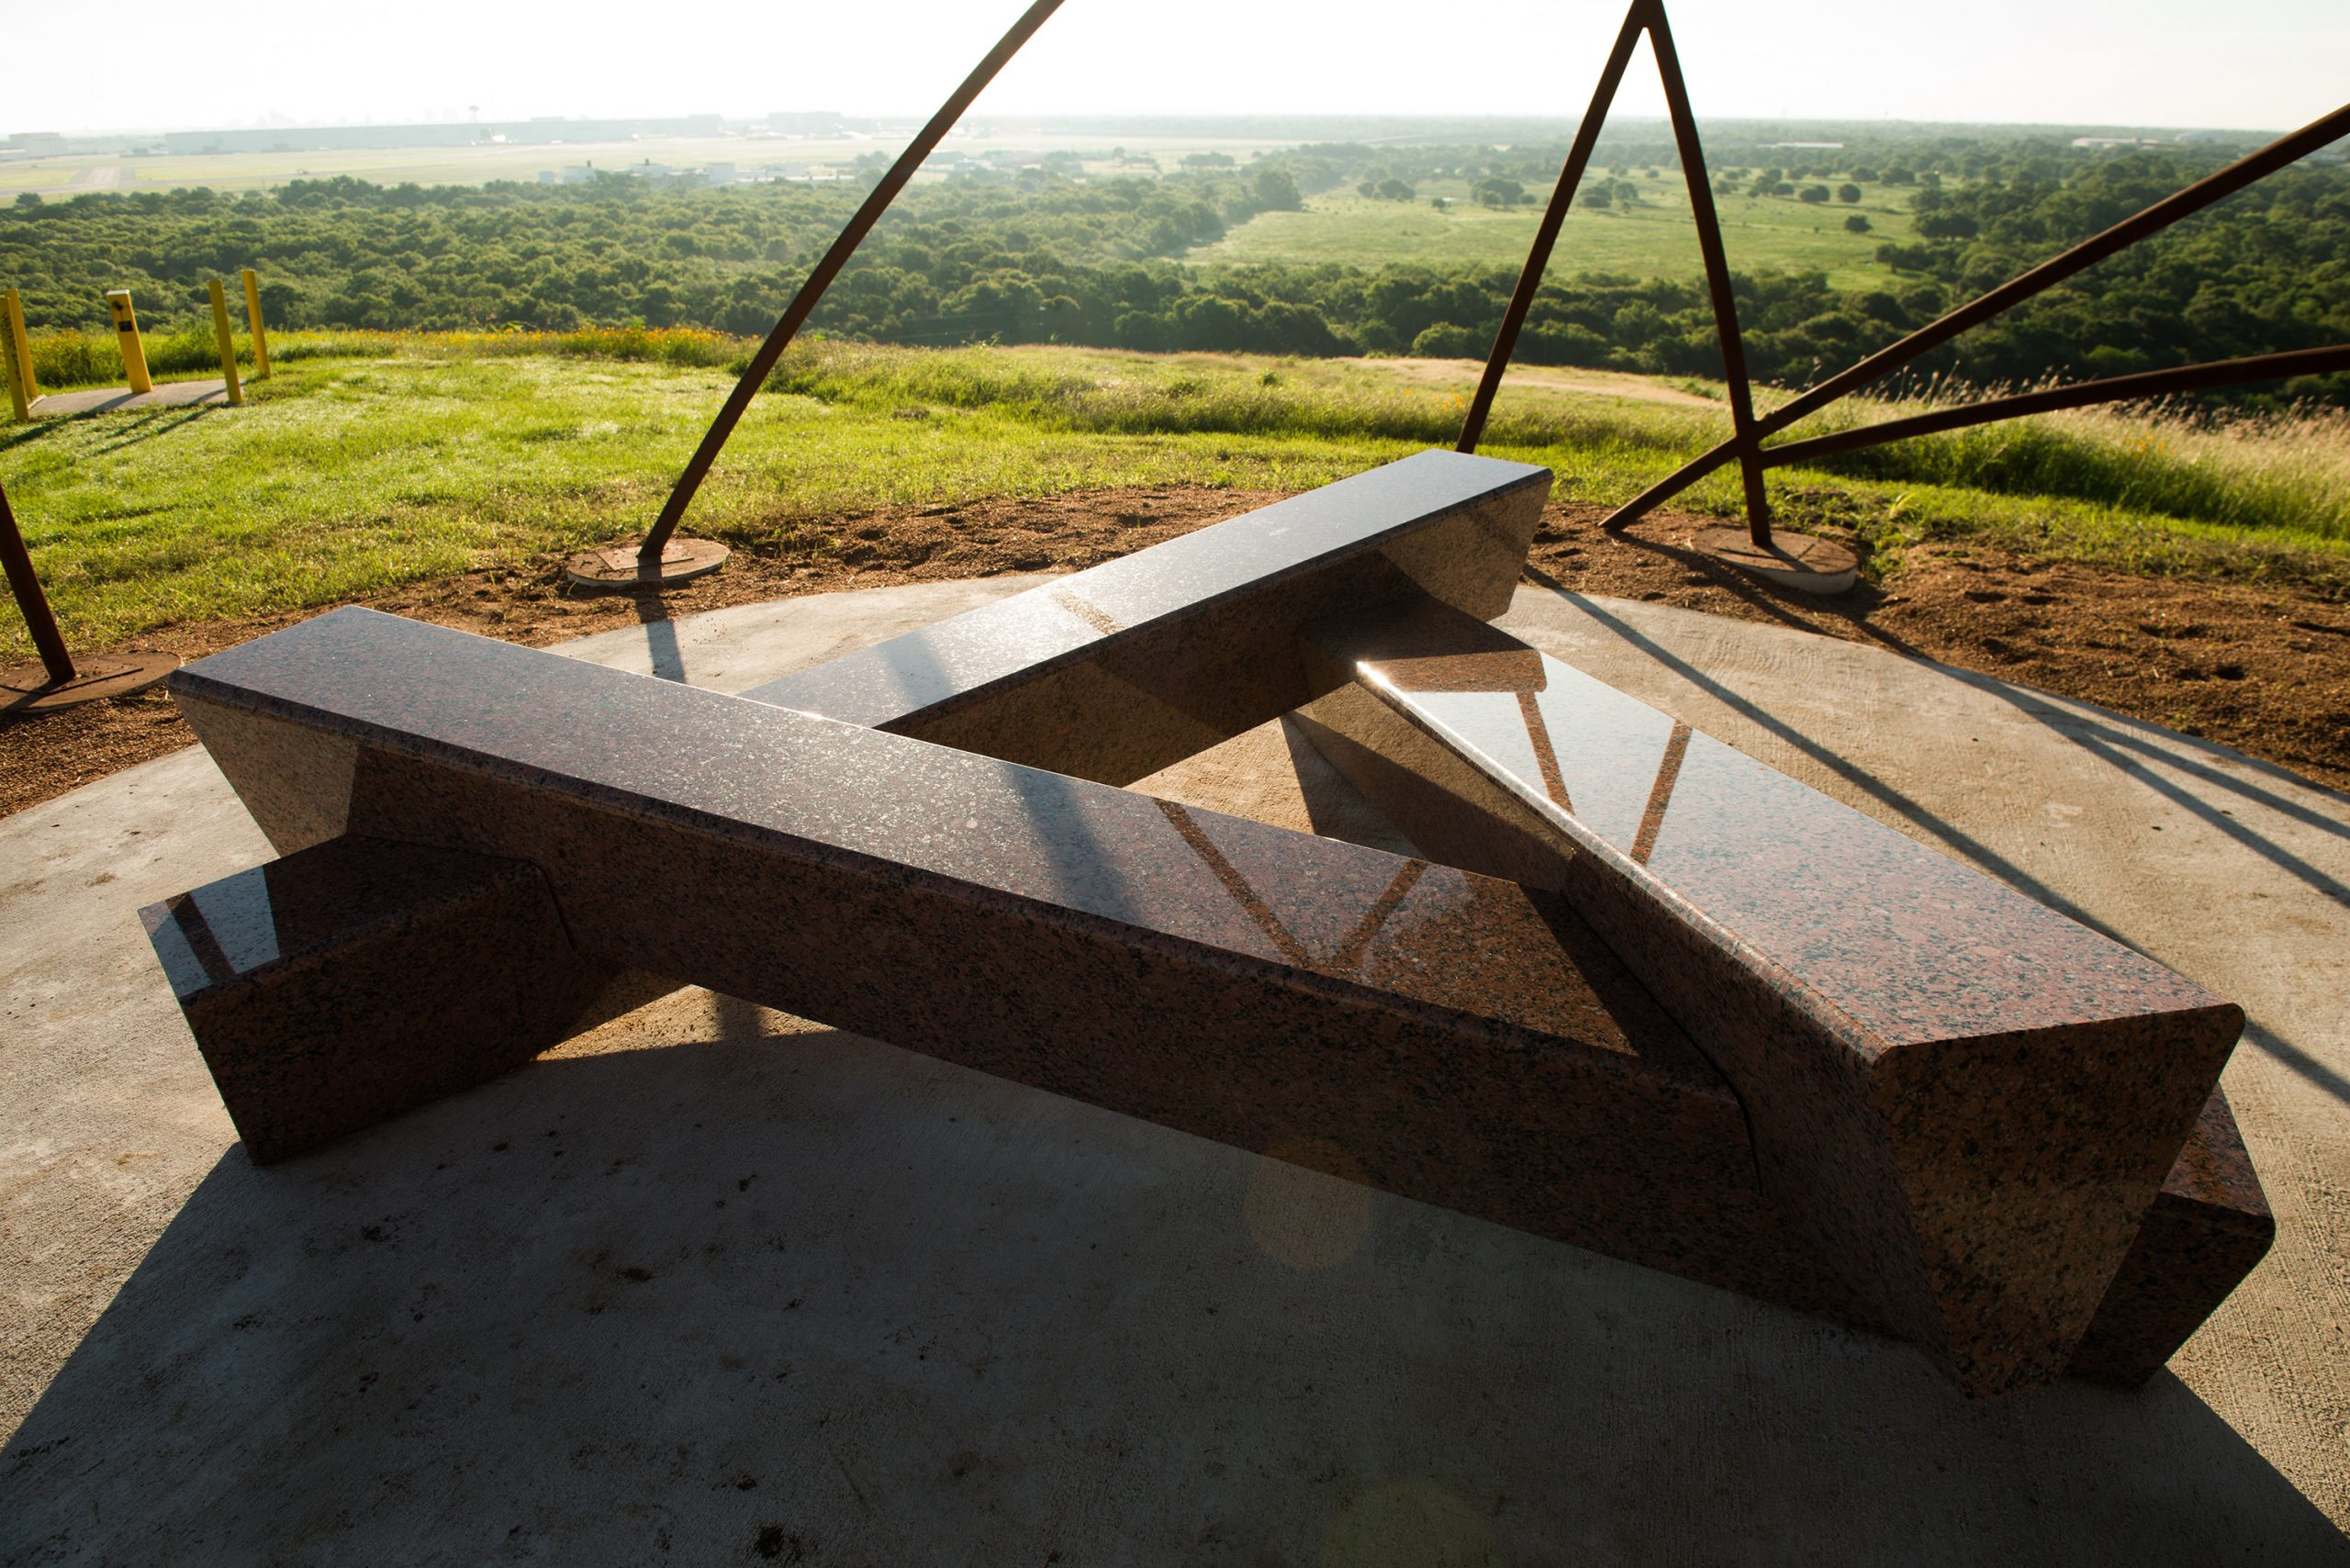 Midden Mound Wickiups